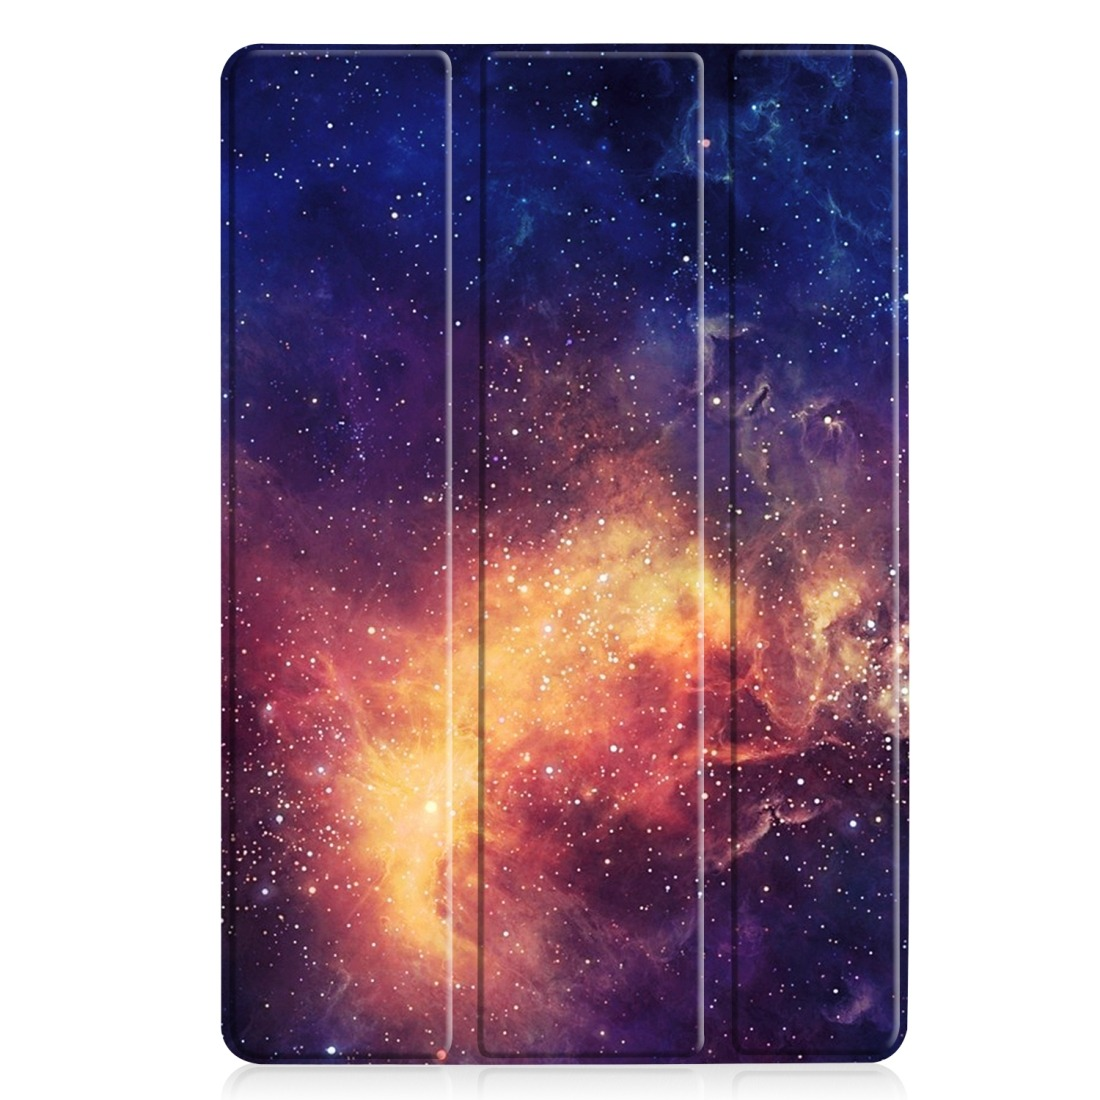 Chicotear Textura Galaxia Padrao Colorido Desenho Horizontal R